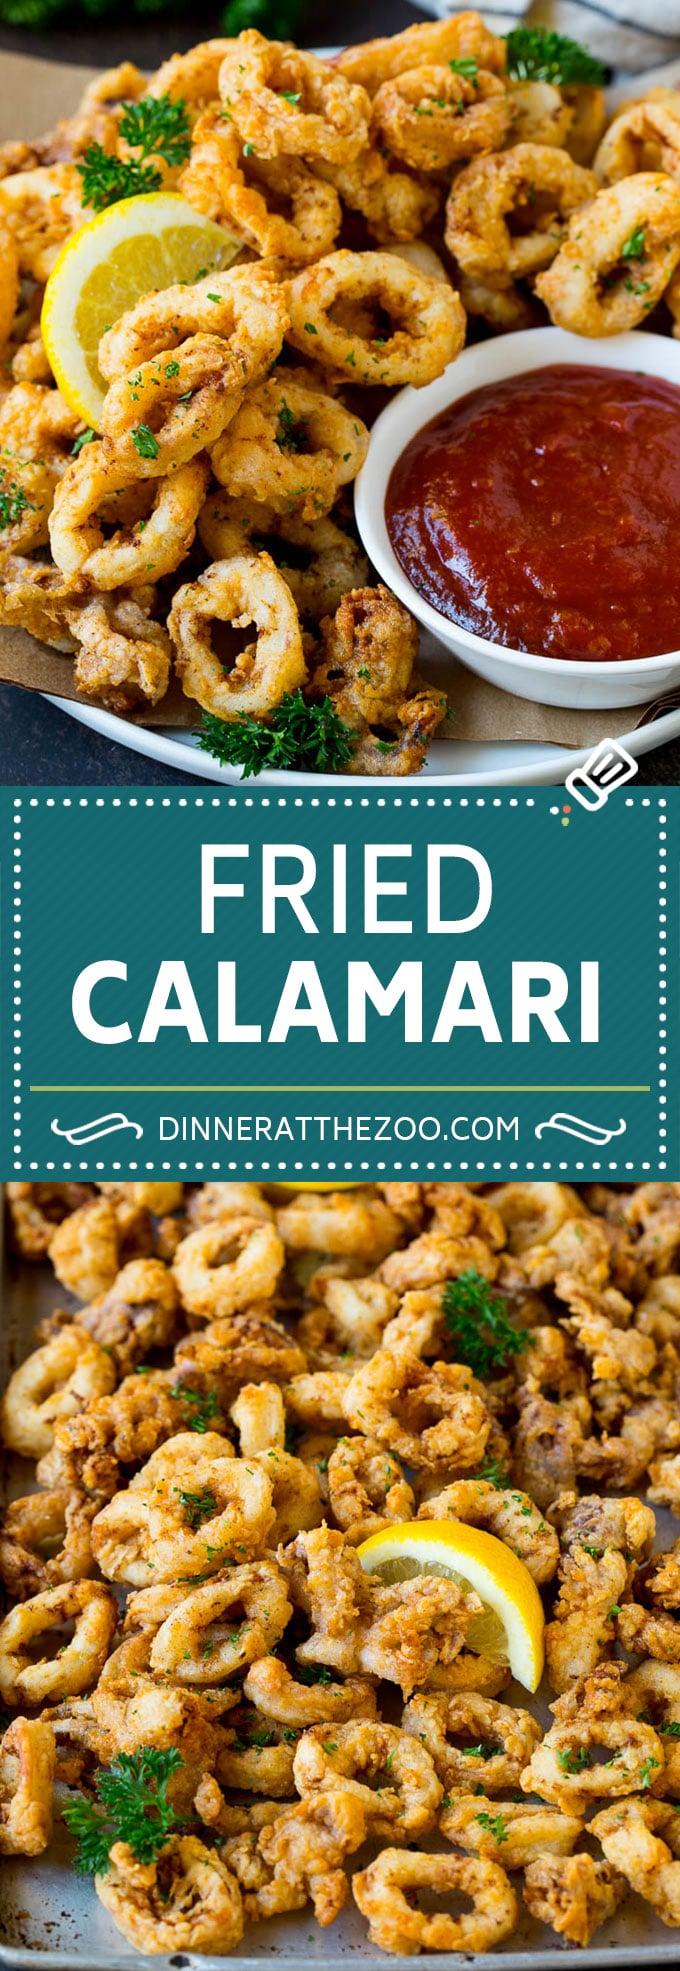 Receta de calamar frito # mariscos # aperitivo # cena # cenaatthezoo